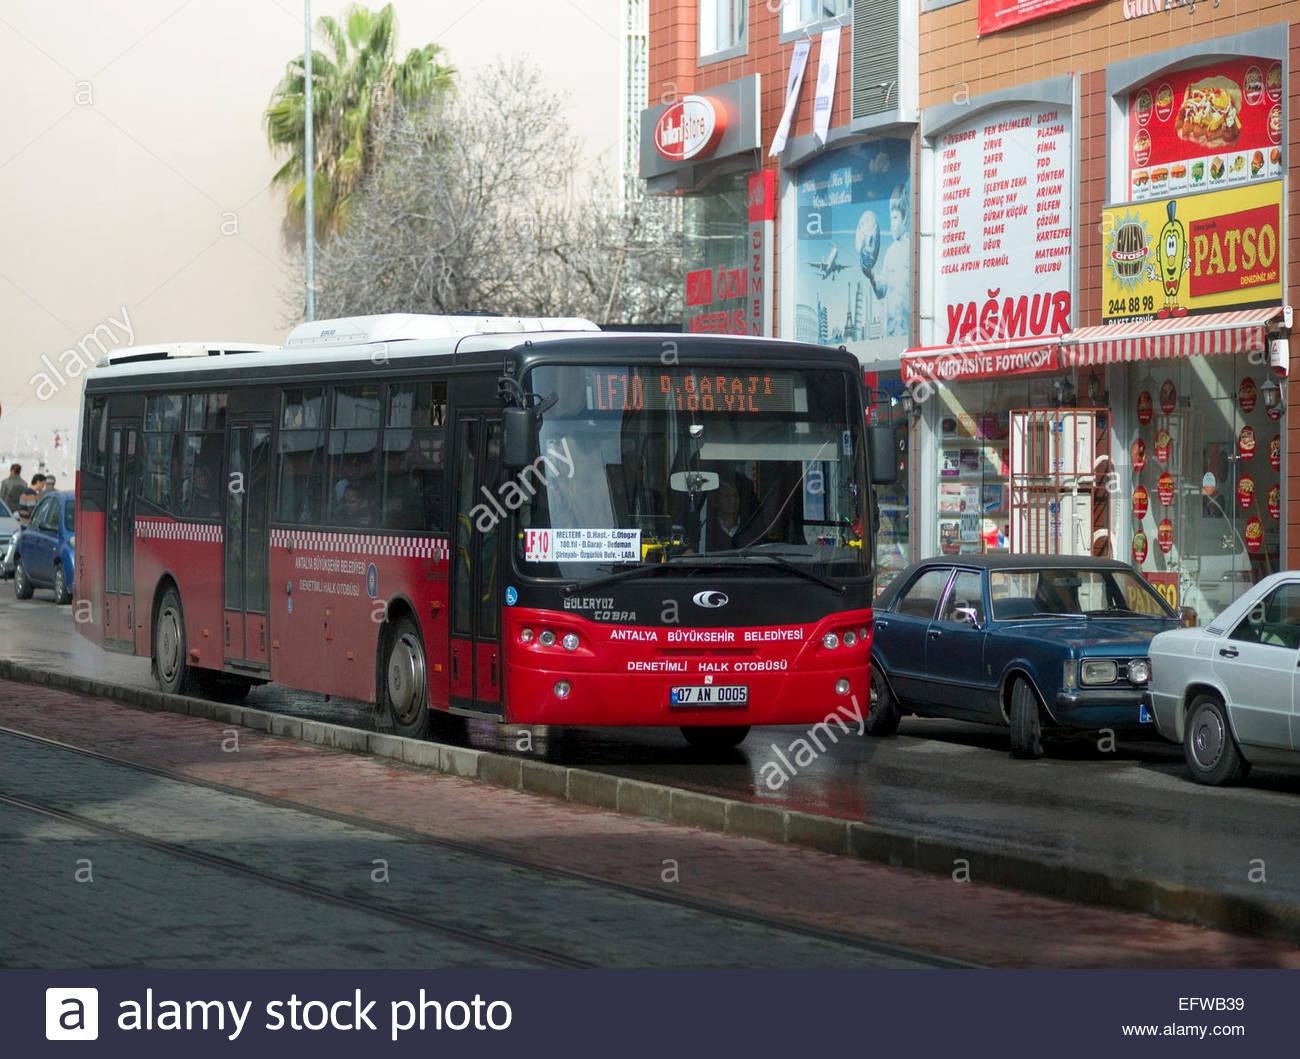 Gigi rivera bus stop girls scene